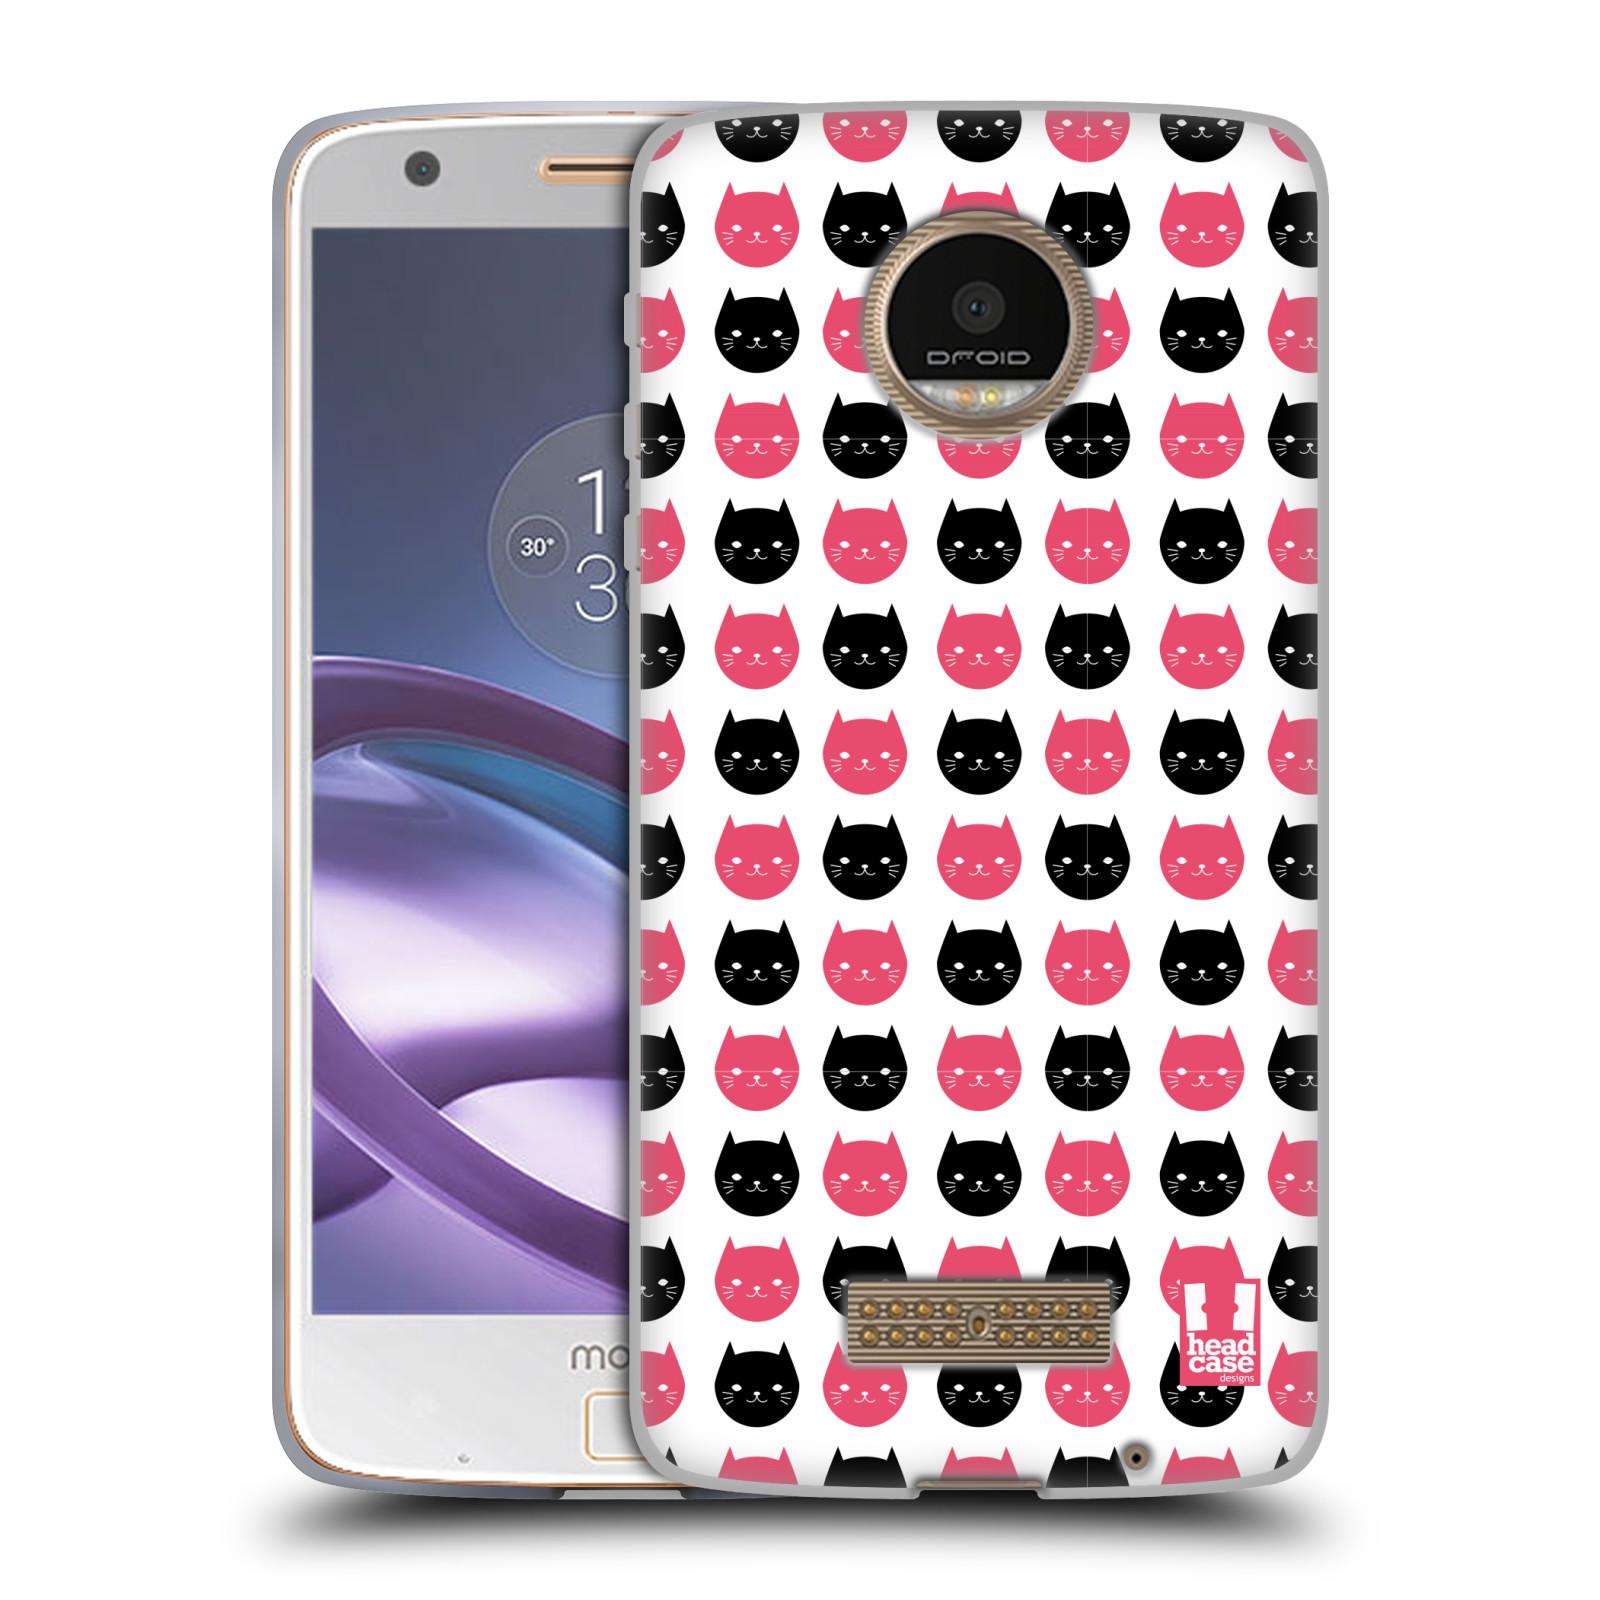 Silikonové pouzdro na mobil Lenovo Moto Z HEAD CASE KOČKY Black and Pink (Silikonový kryt či obal na mobilní telefon Lenovo Moto Z)